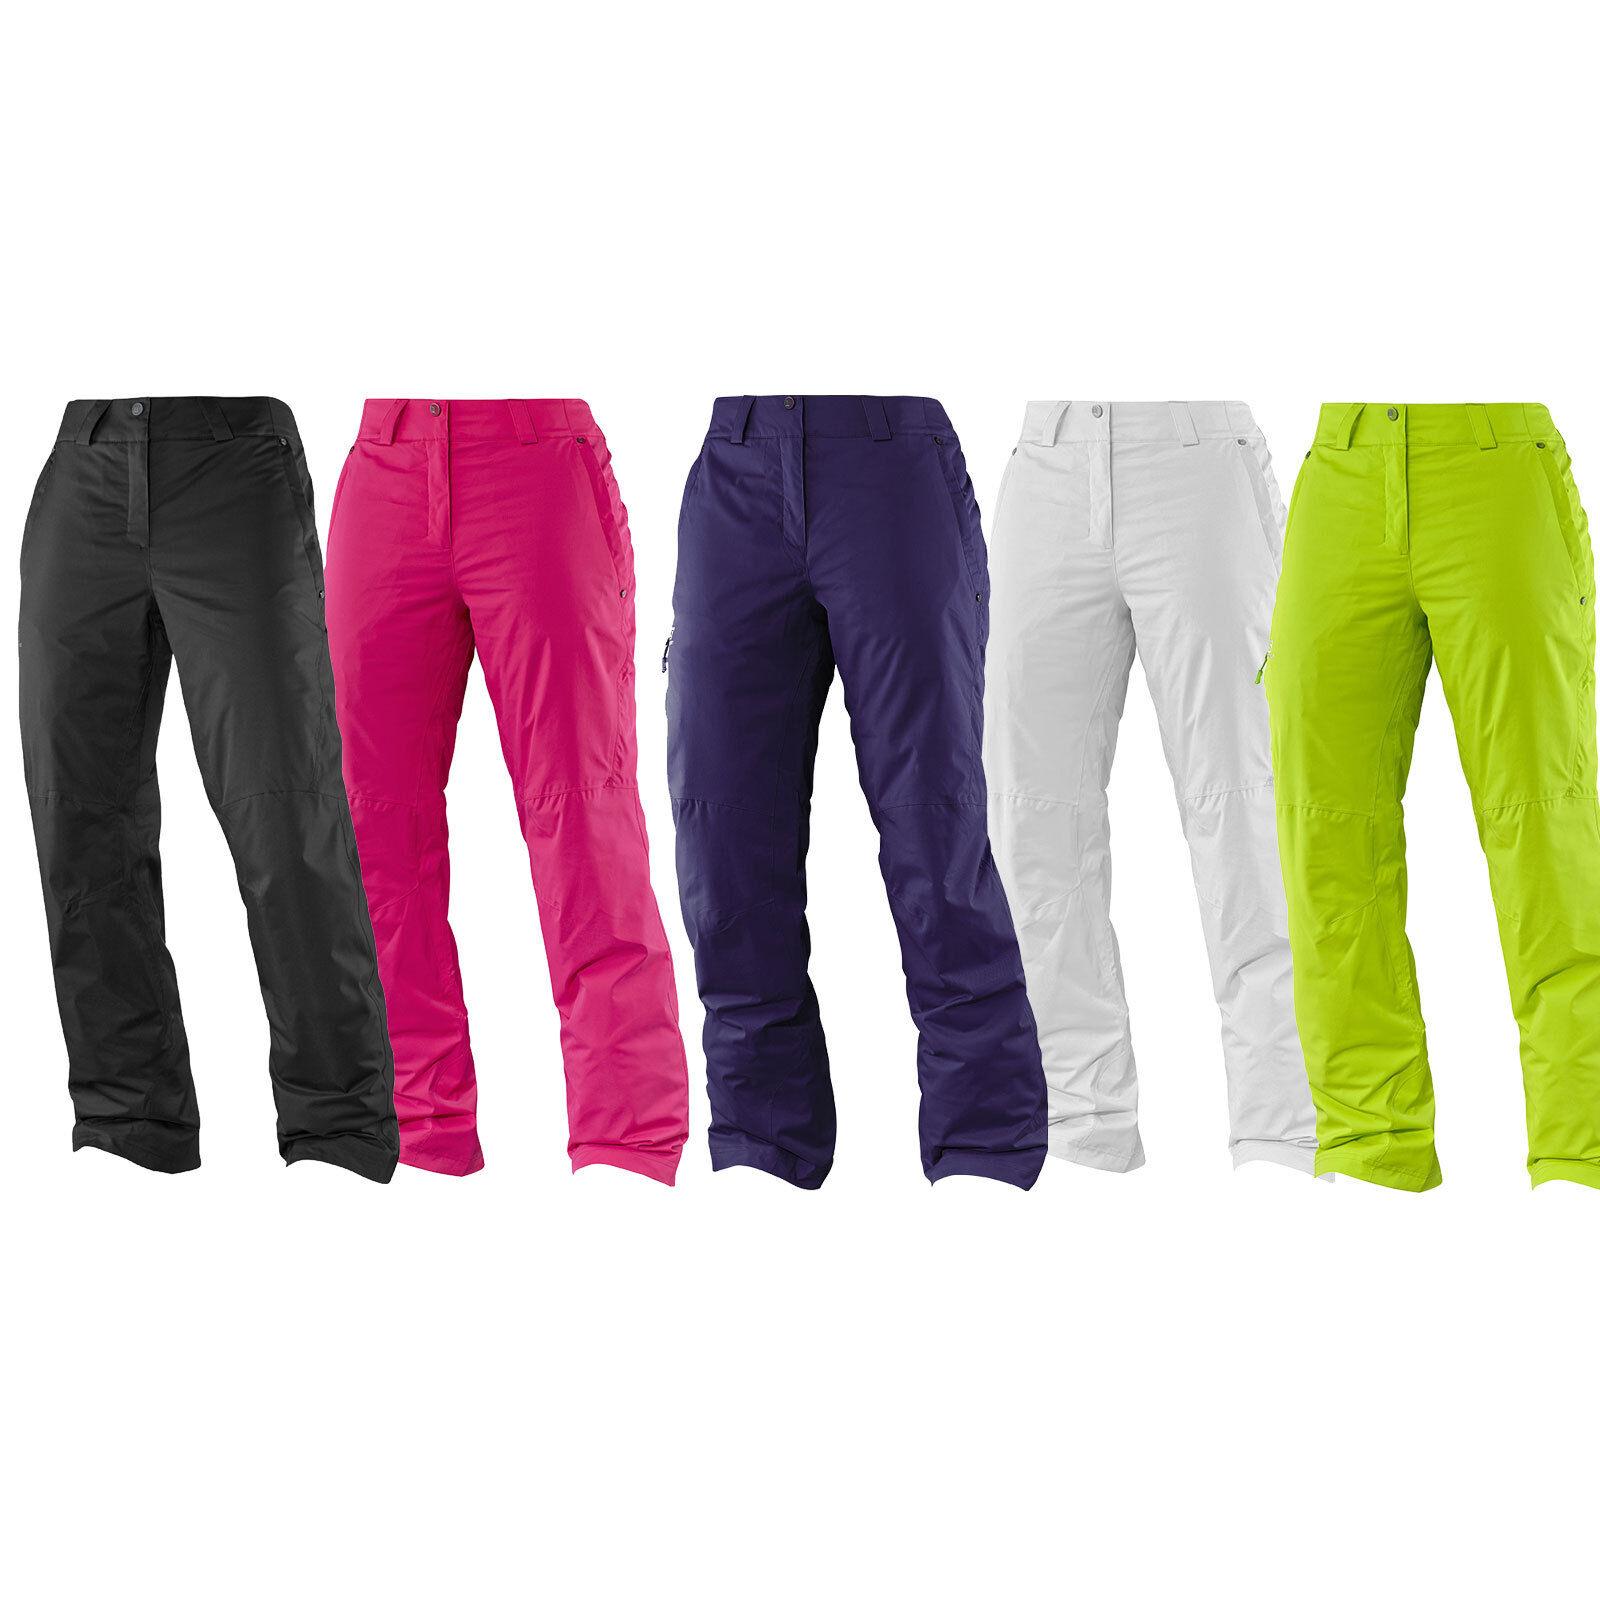 Salomon Response Pant Women's Ski Pants Snowboard Pant Functional Pant Ski Pants